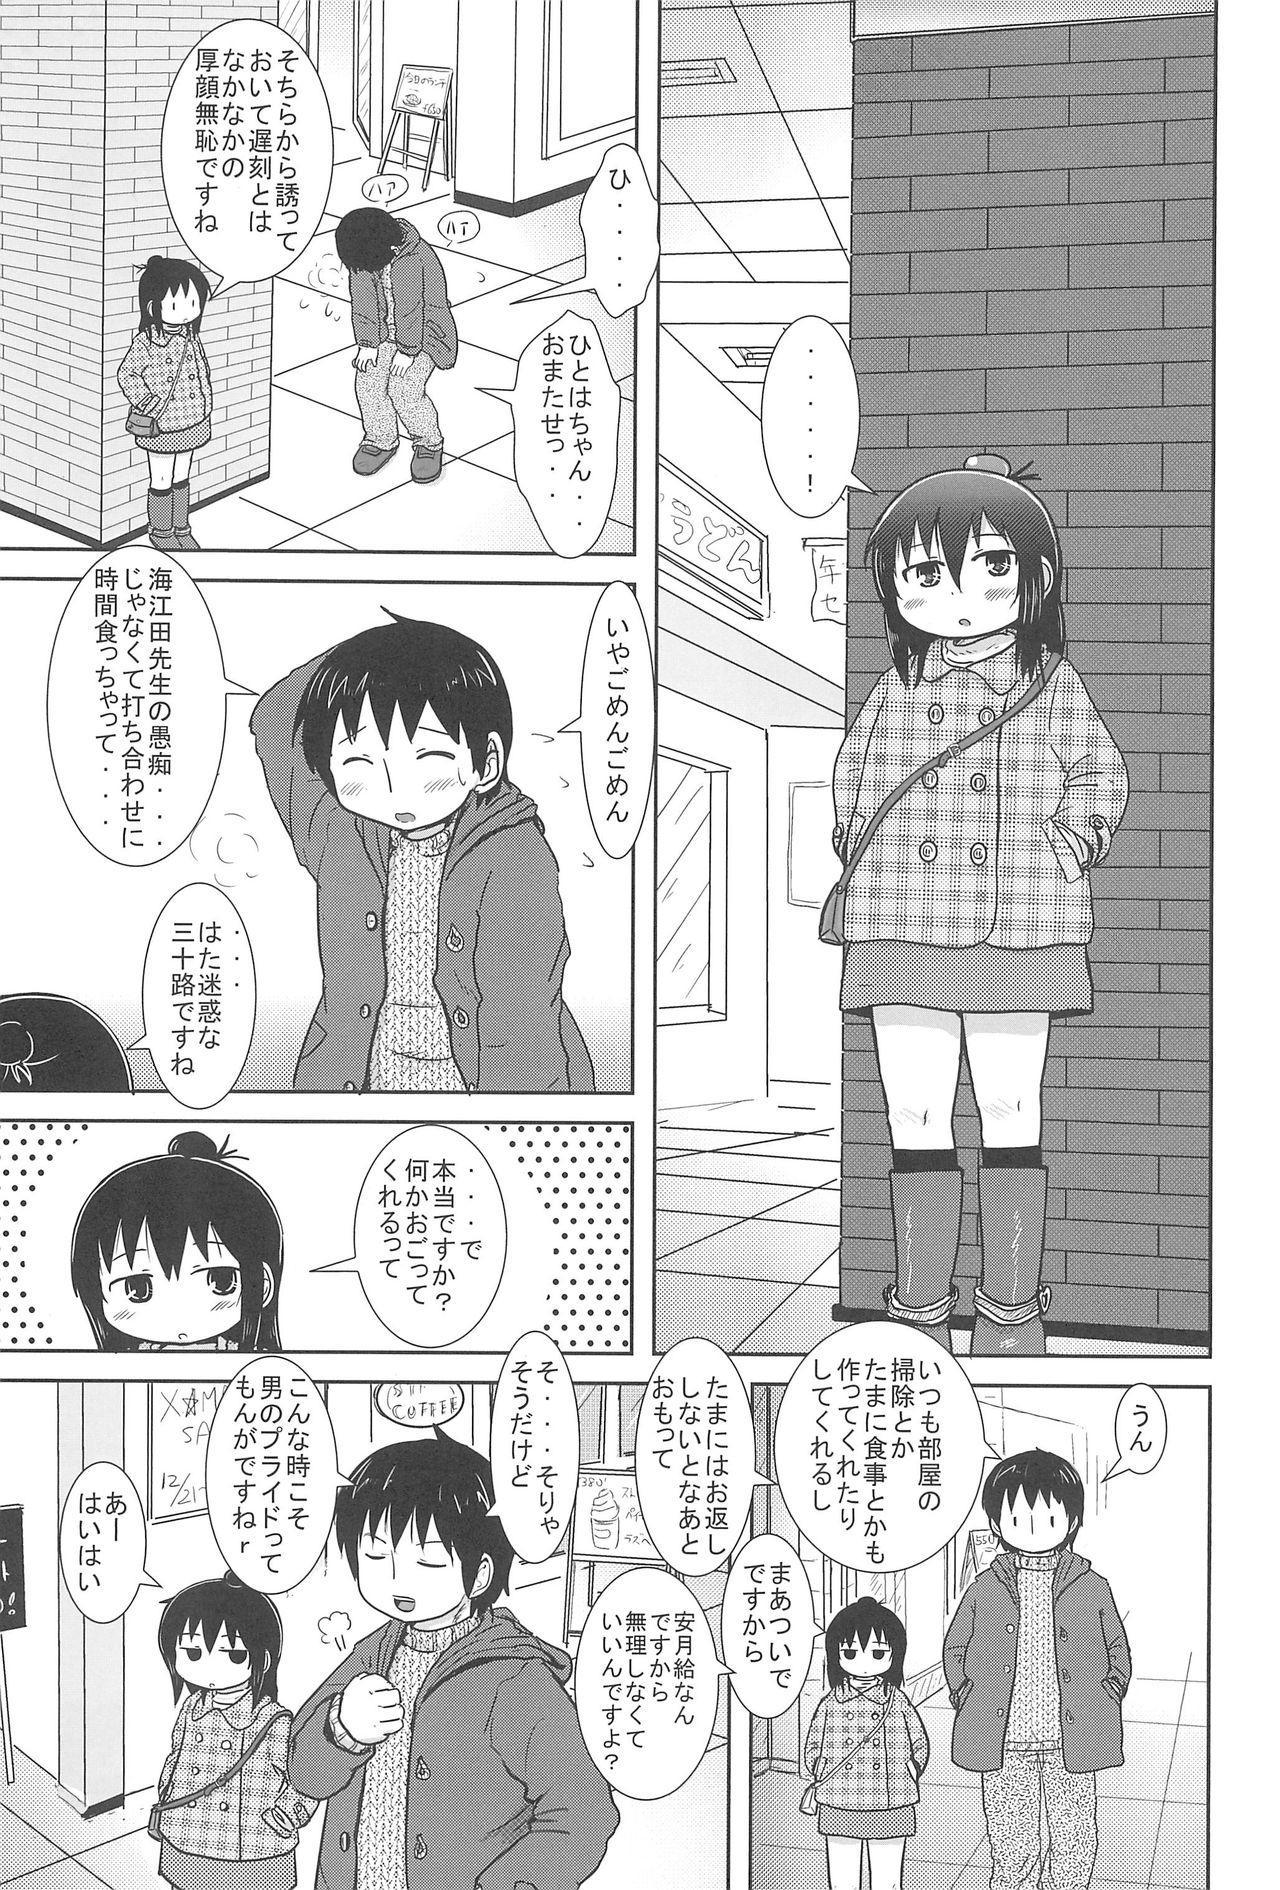 Futari de Oishiku 2